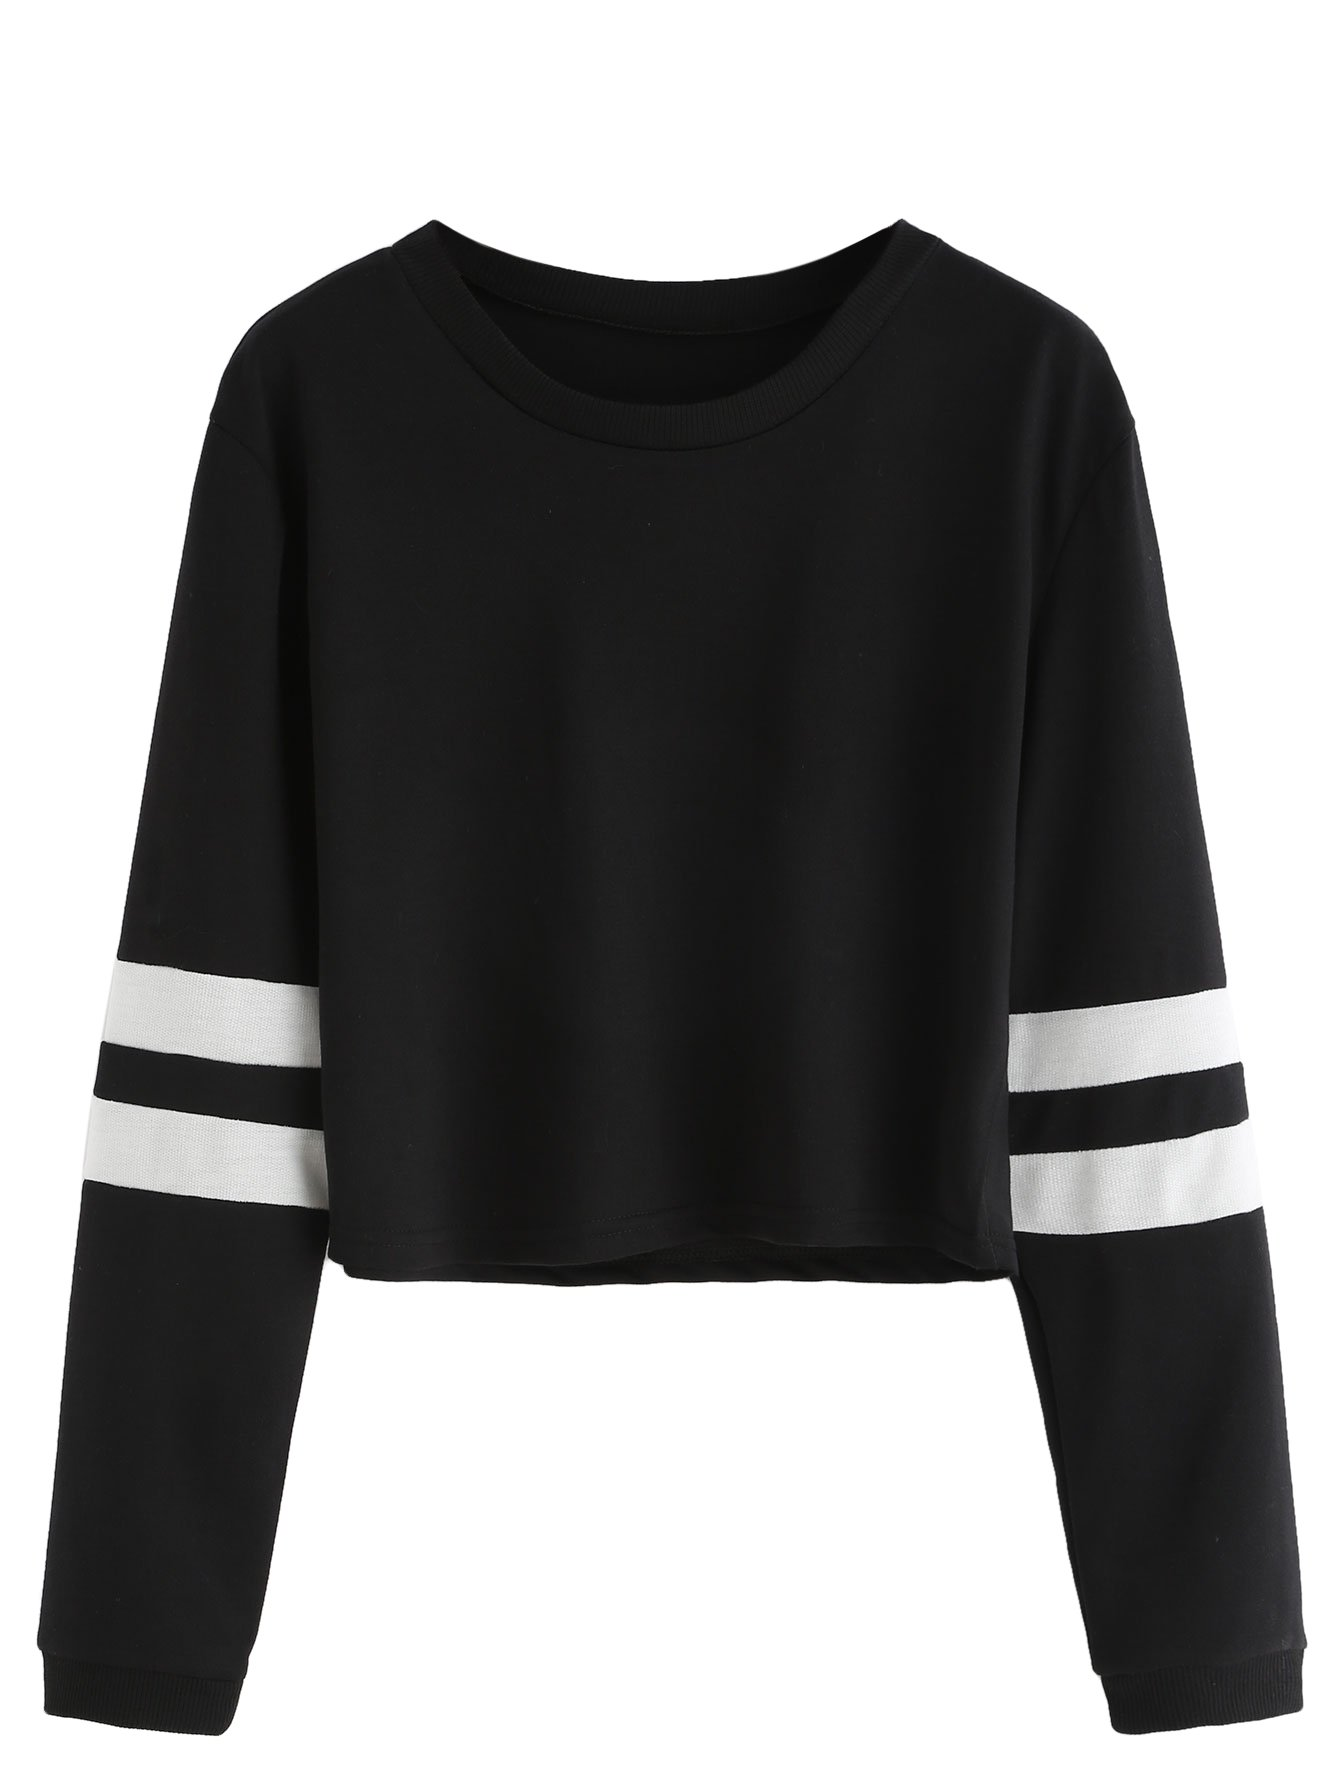 SweatyRocks Women's Striped Long Sleeve Crewneck Crop Top Sweatshirt Black M